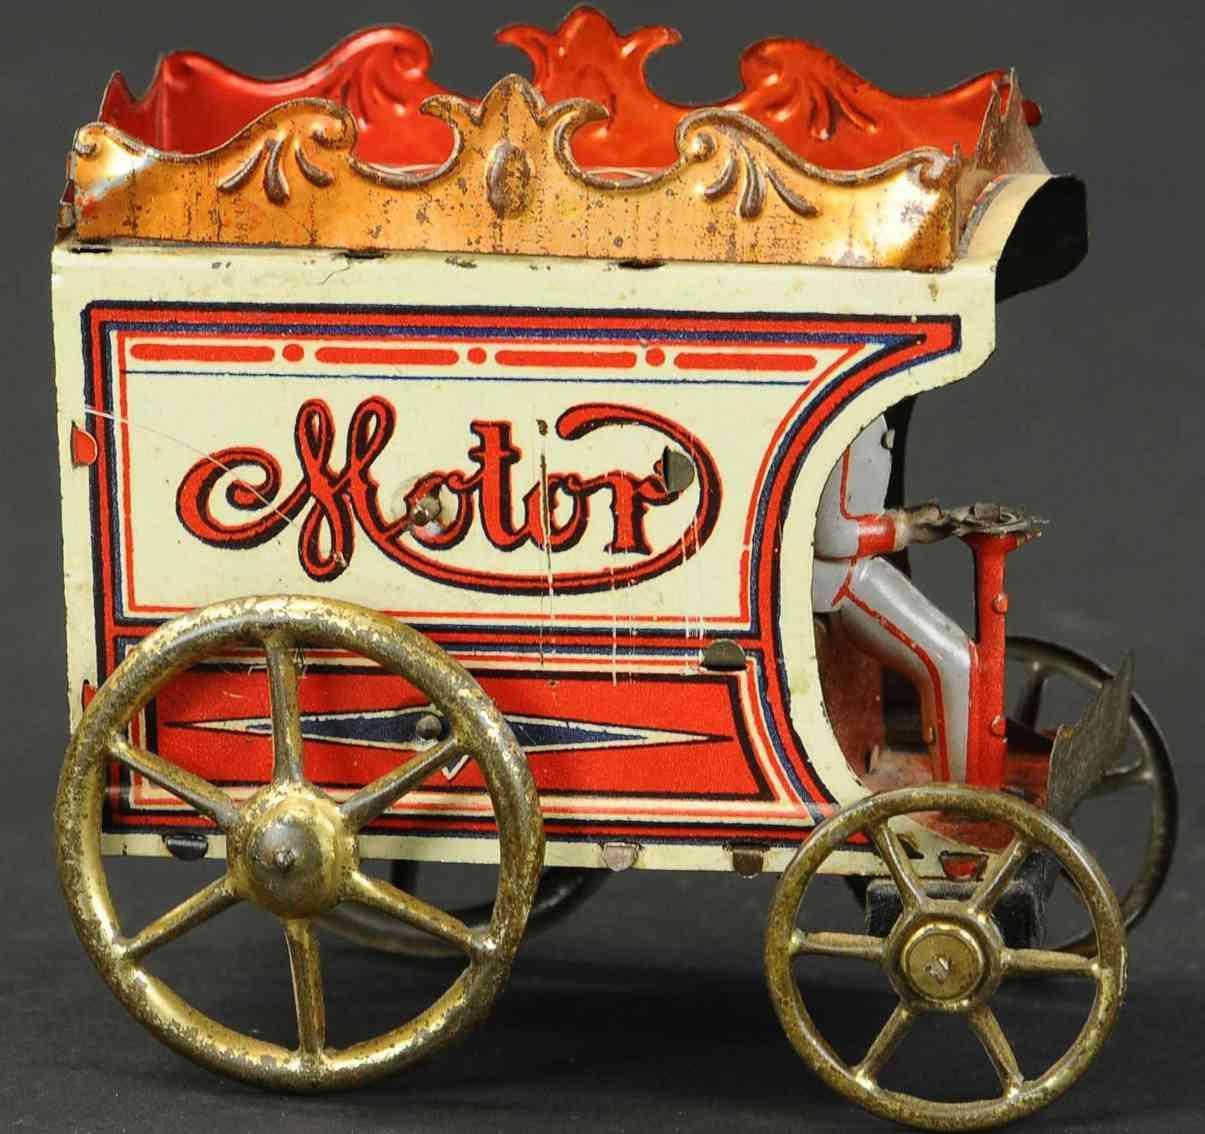 reil co issmayer orobr tin toy delivery van clockwork red white gold